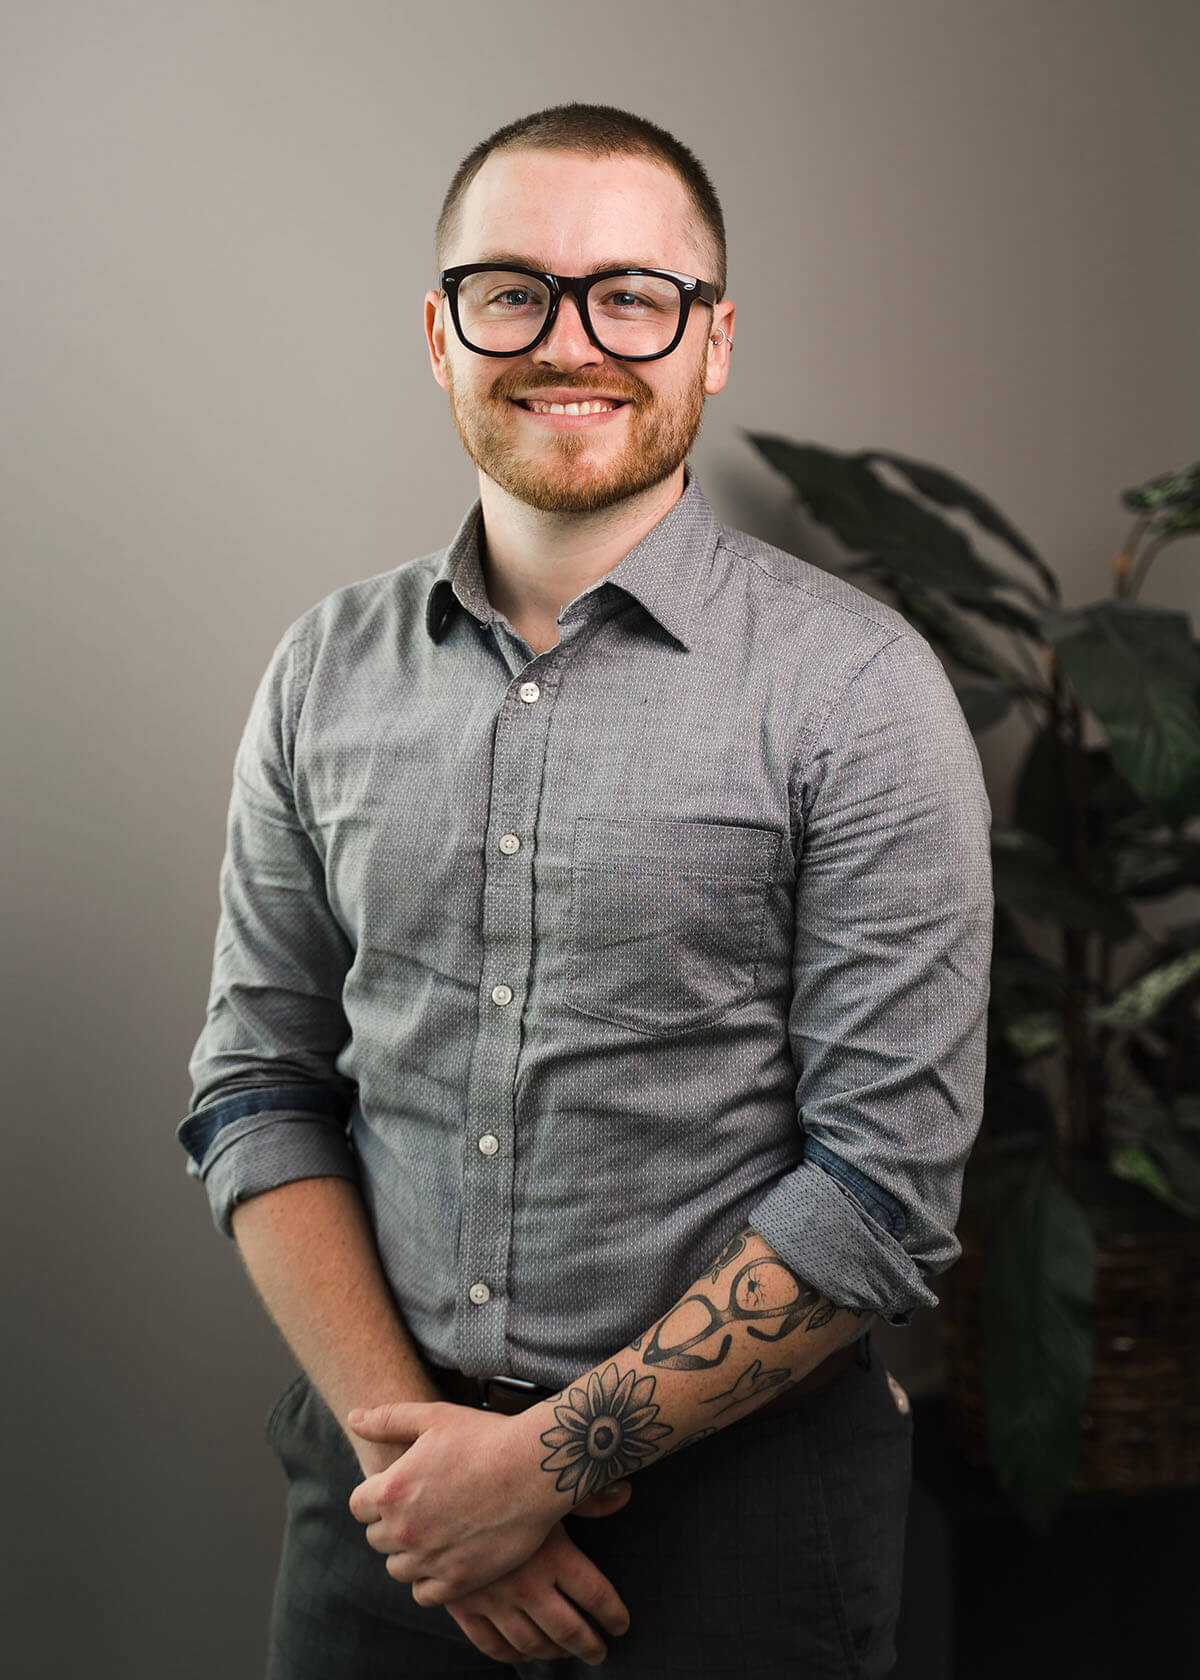 Scott McFadden's profile image